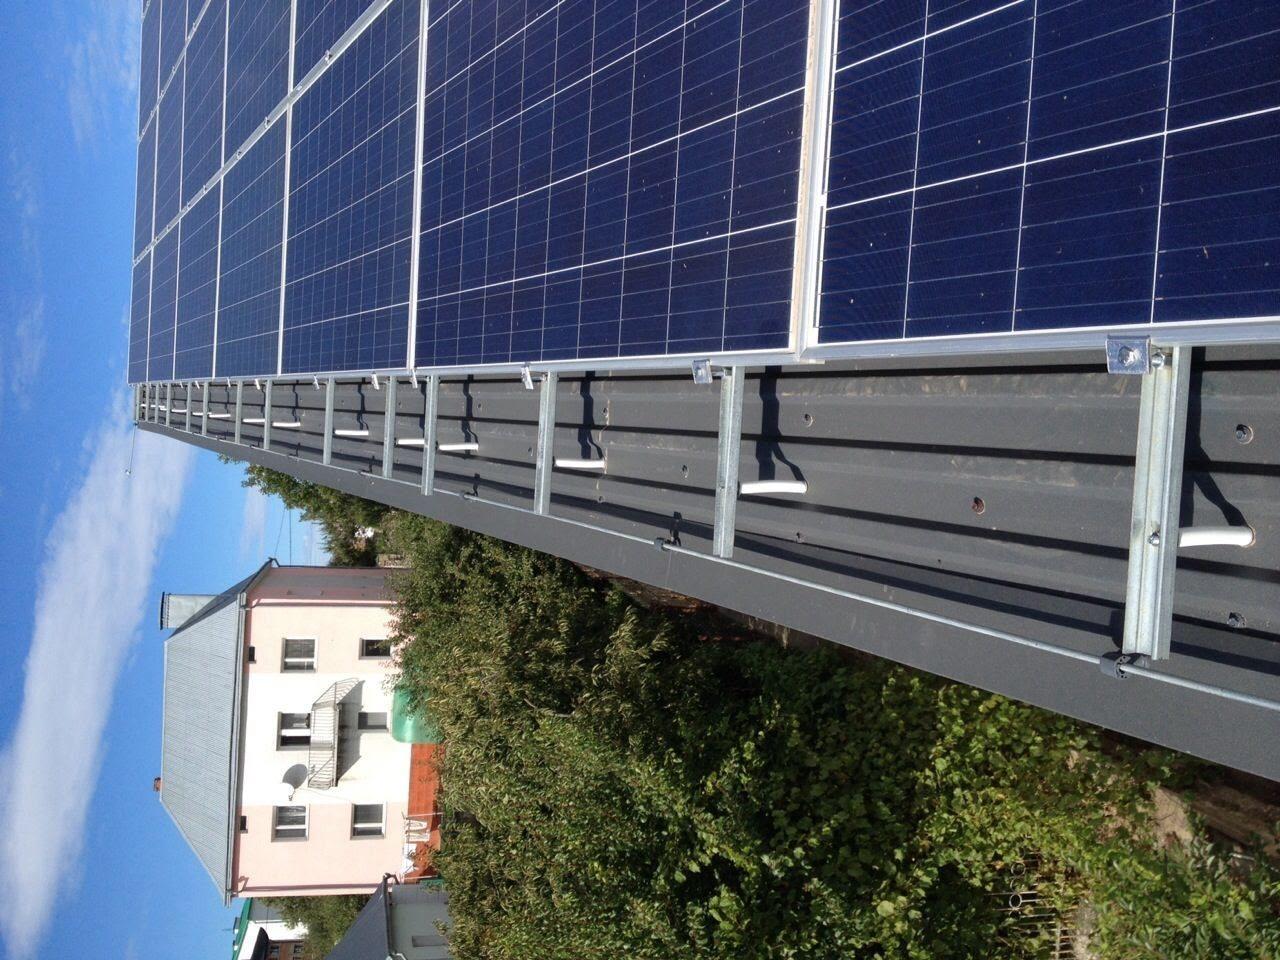 Блискавкозахист соняшних панелей.